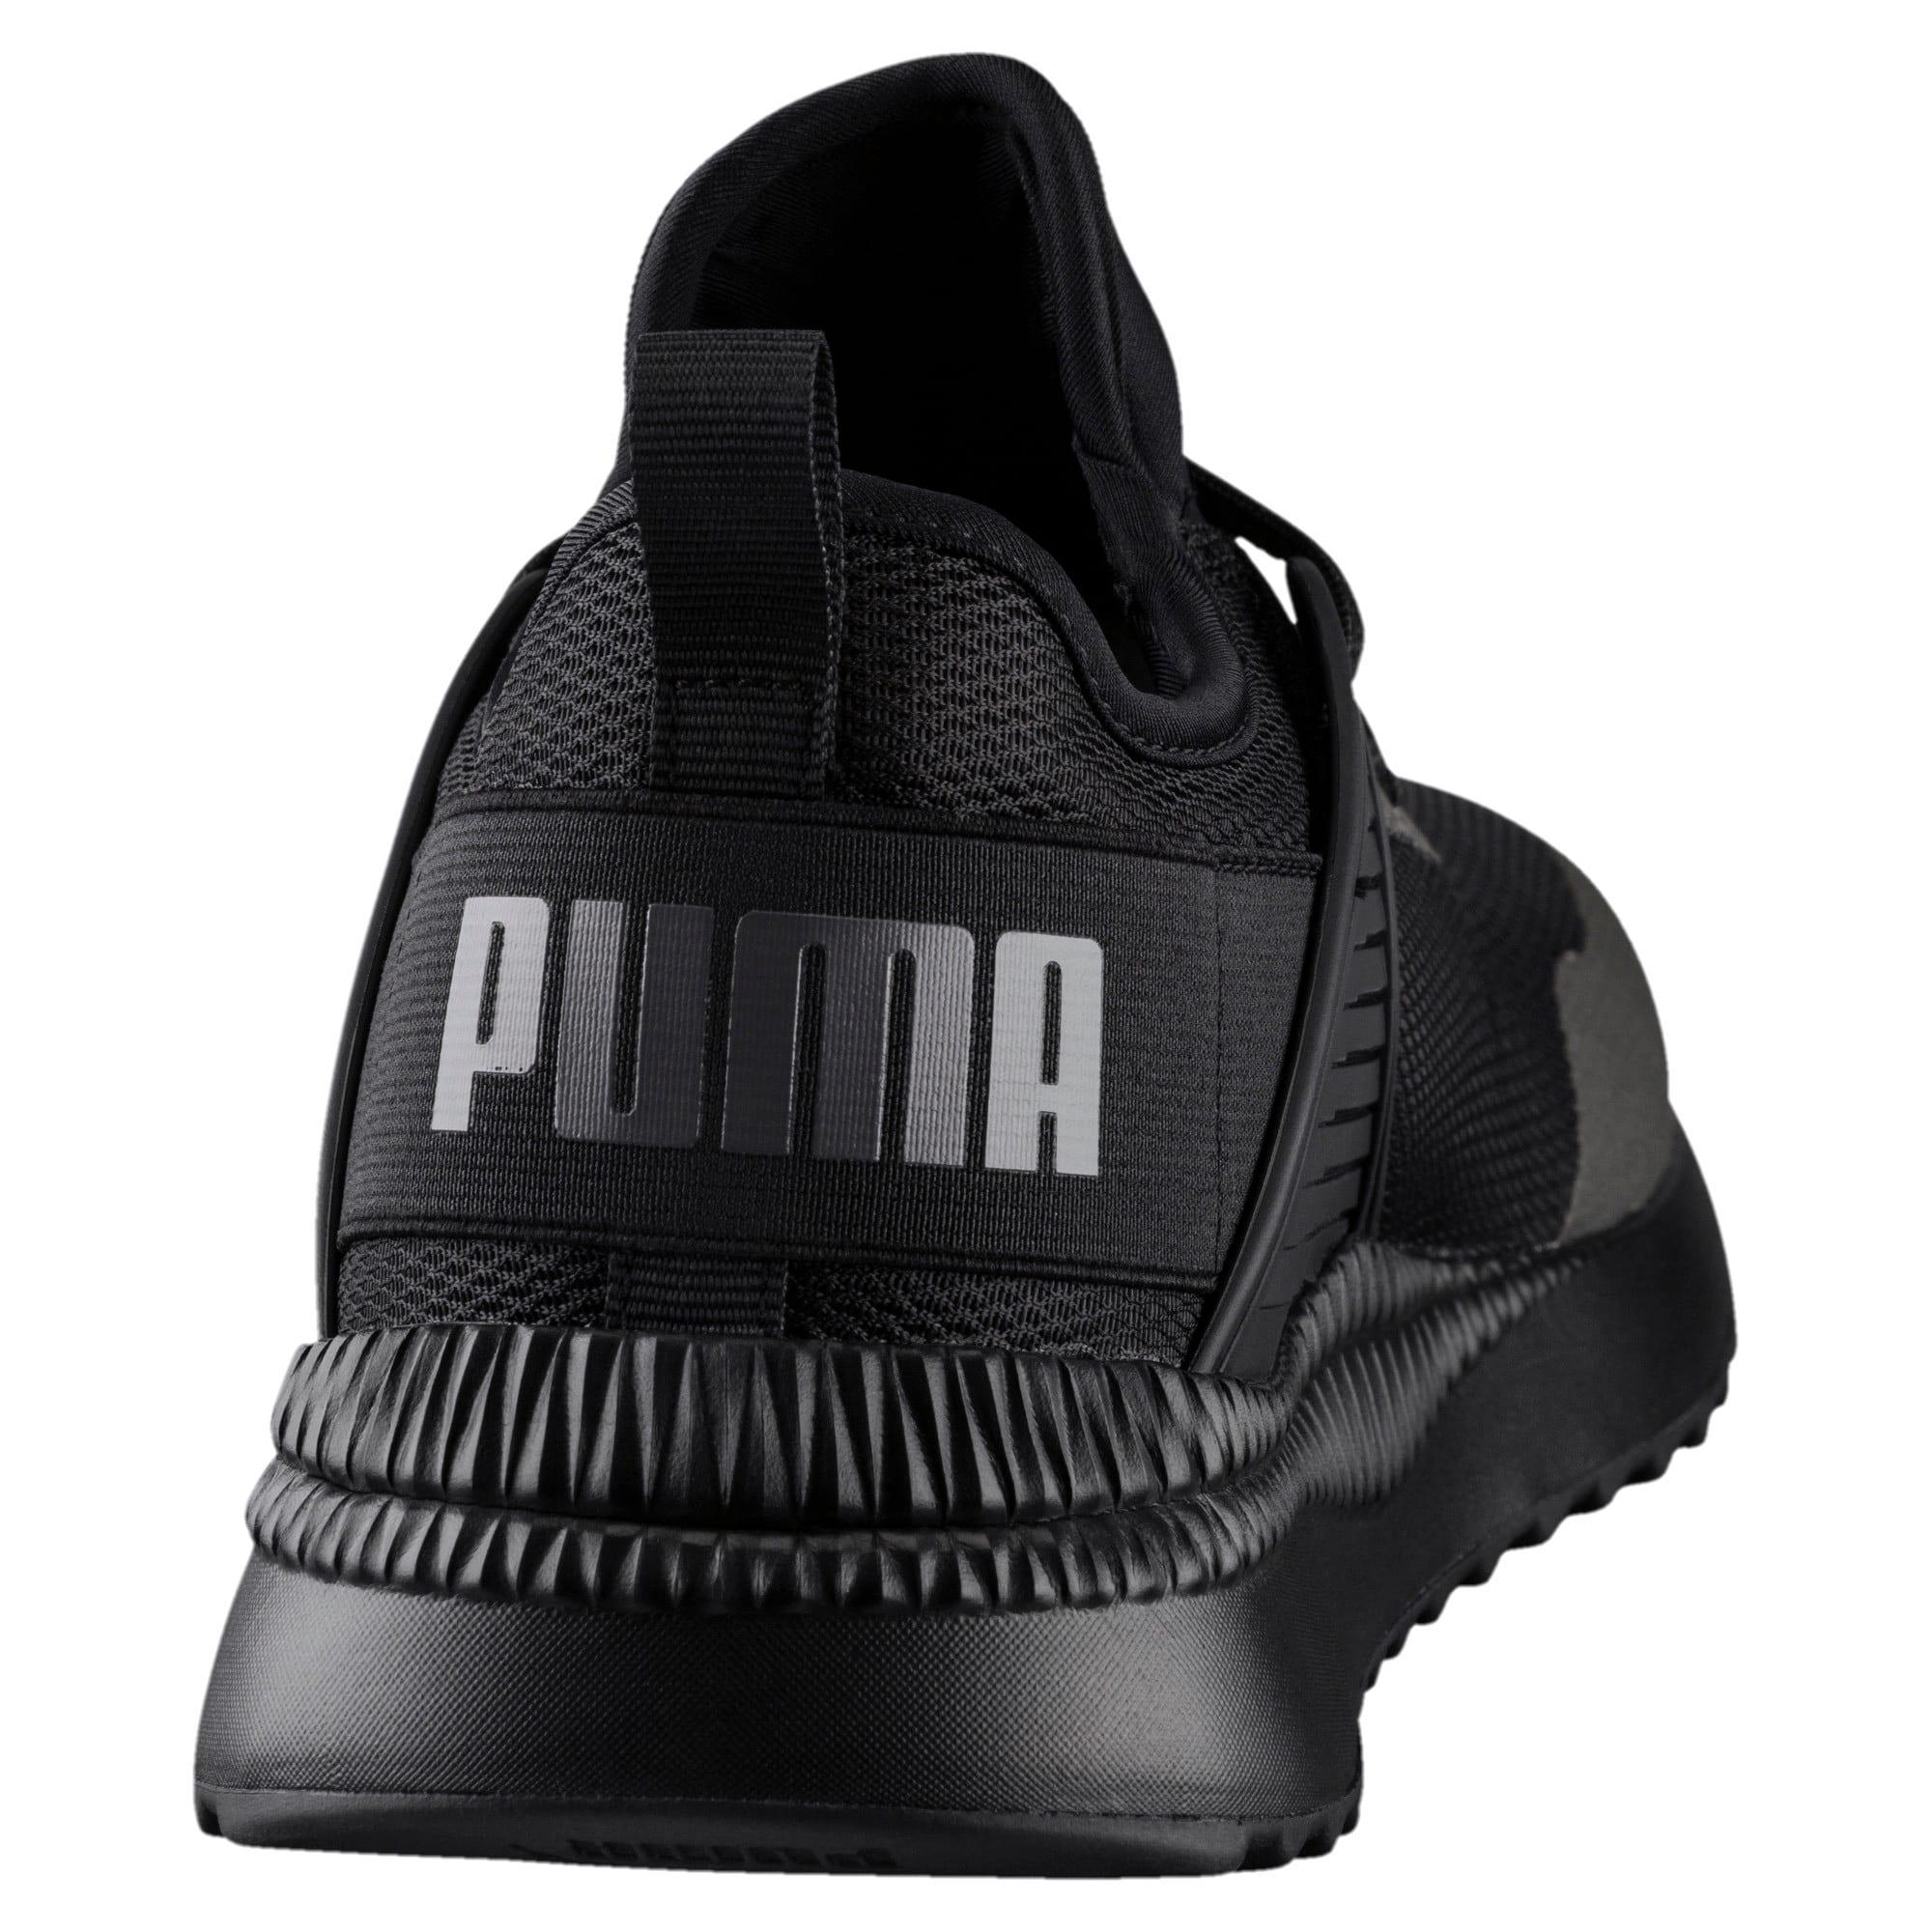 Thumbnail 4 of Pacer Next Cage Sneakers, Puma Black-Puma Black, medium